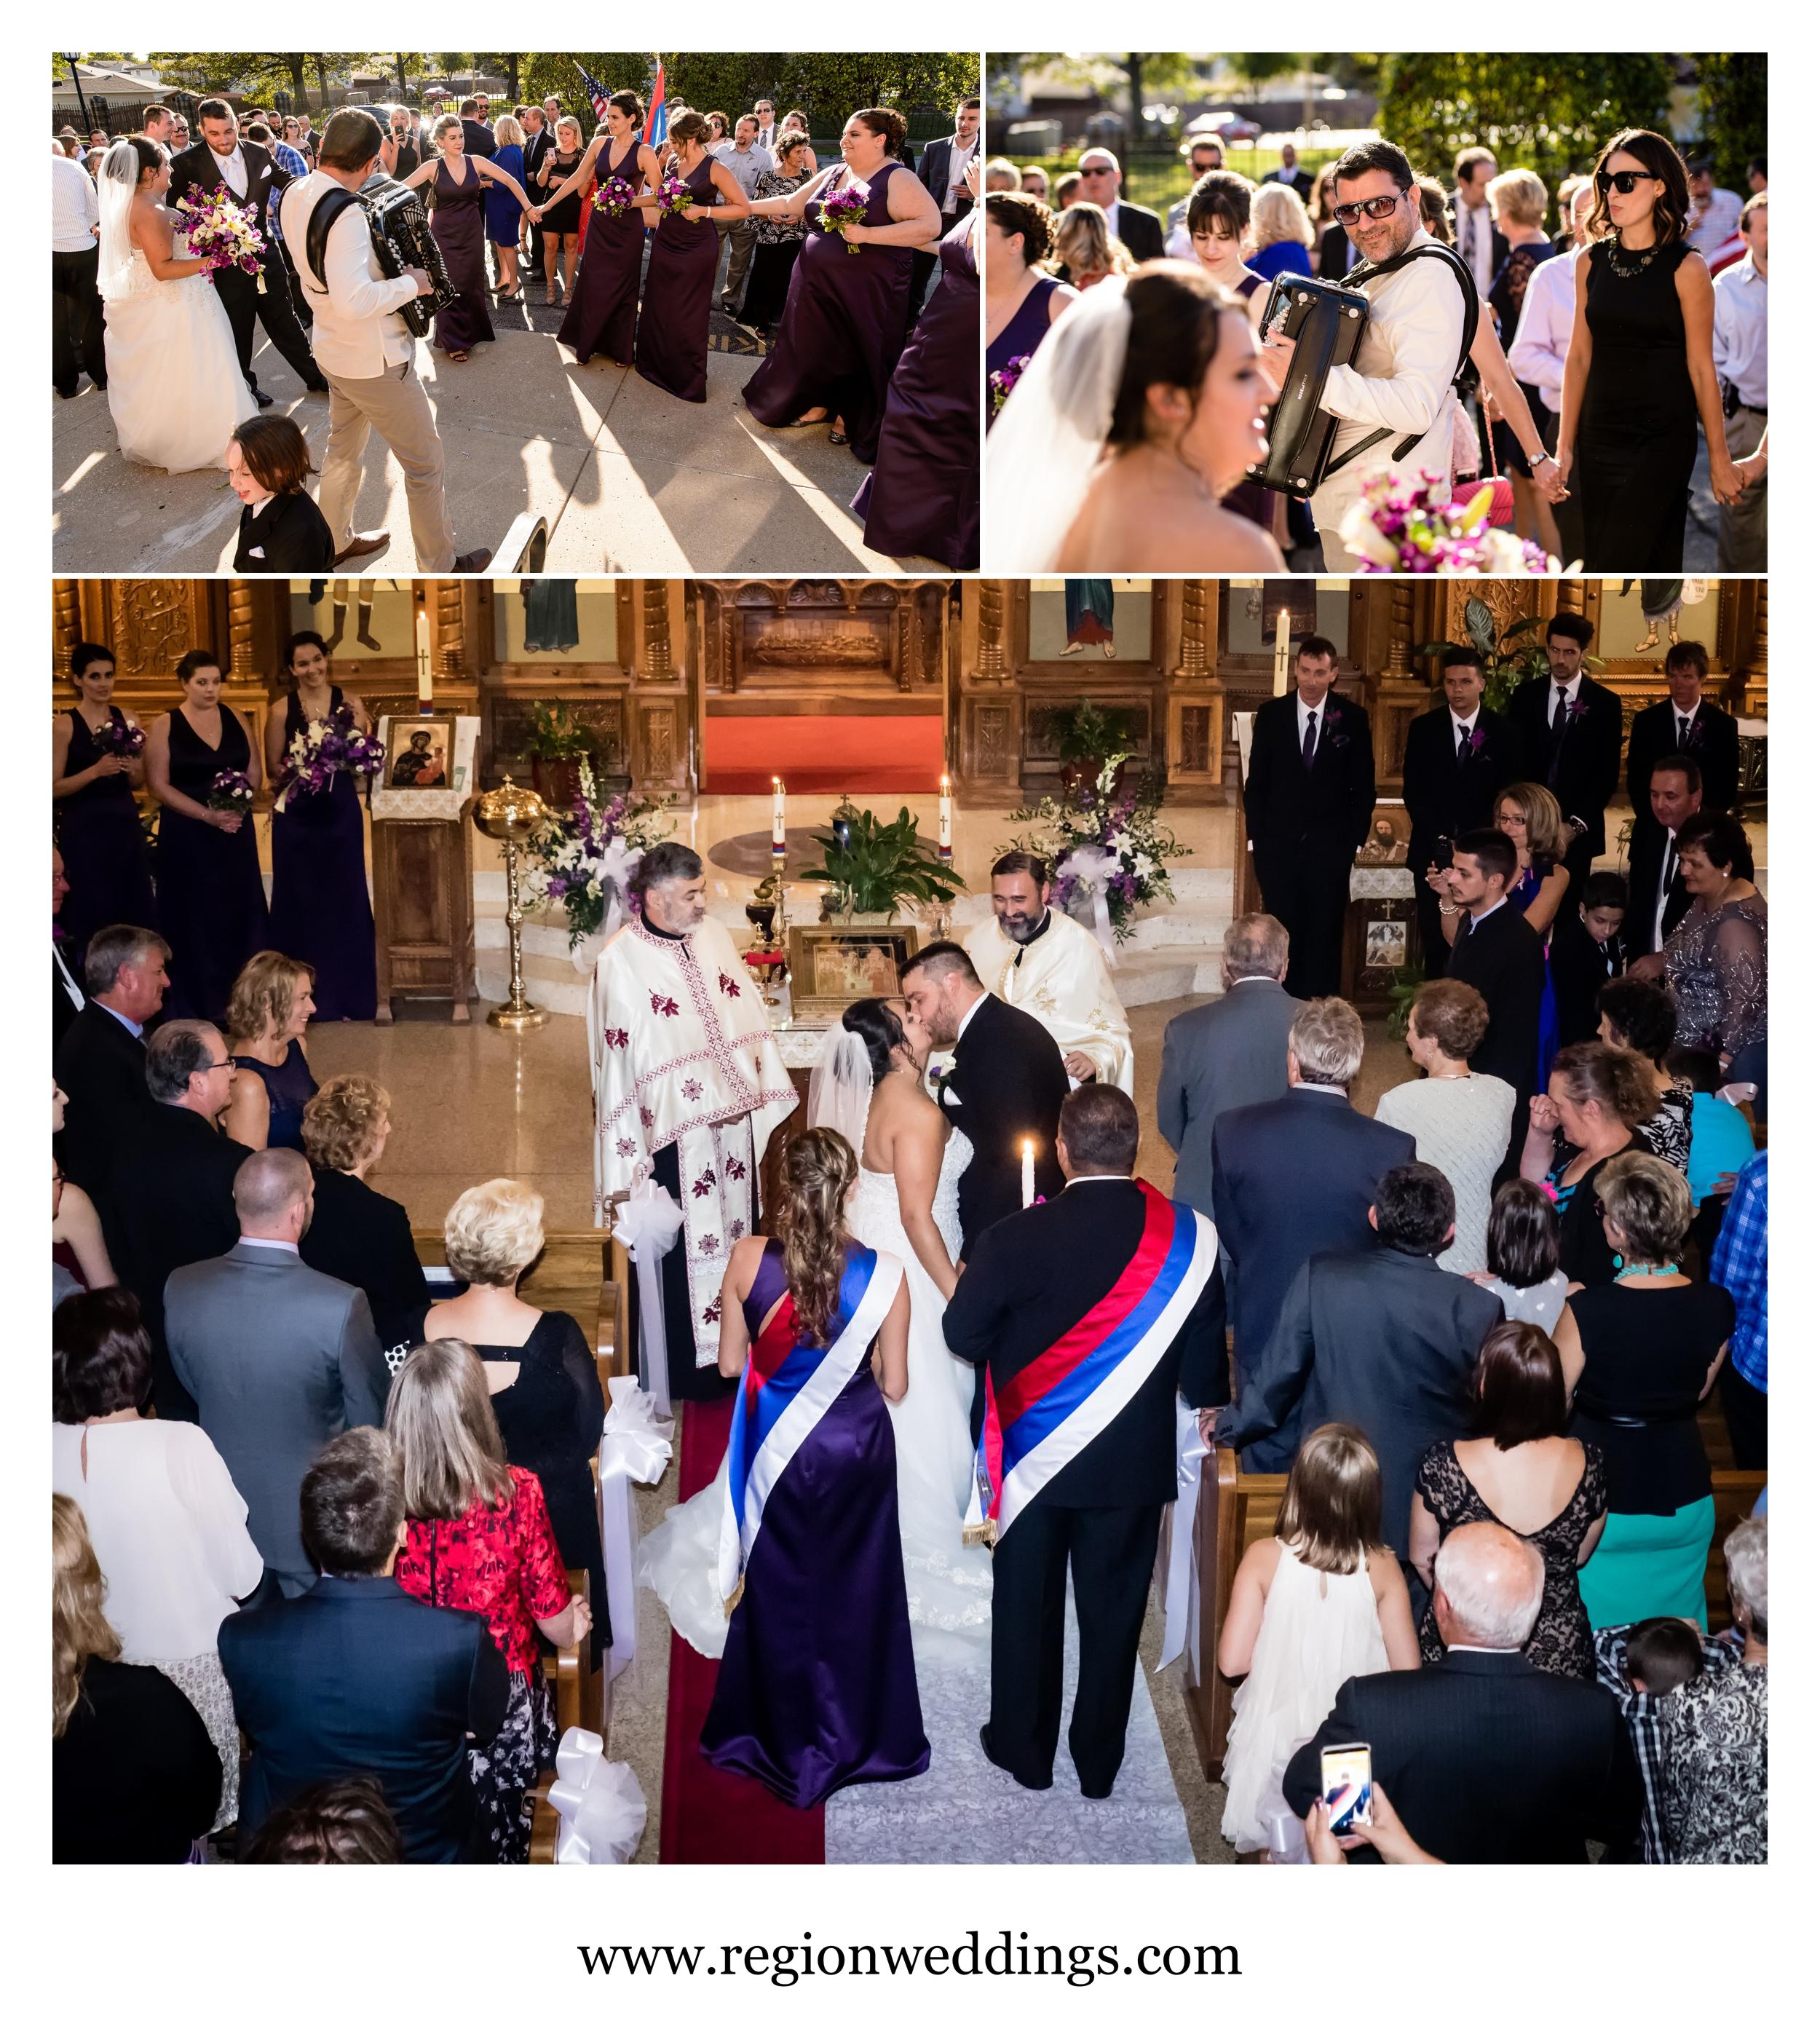 Post ceremony celebration at a Serbian wedding.